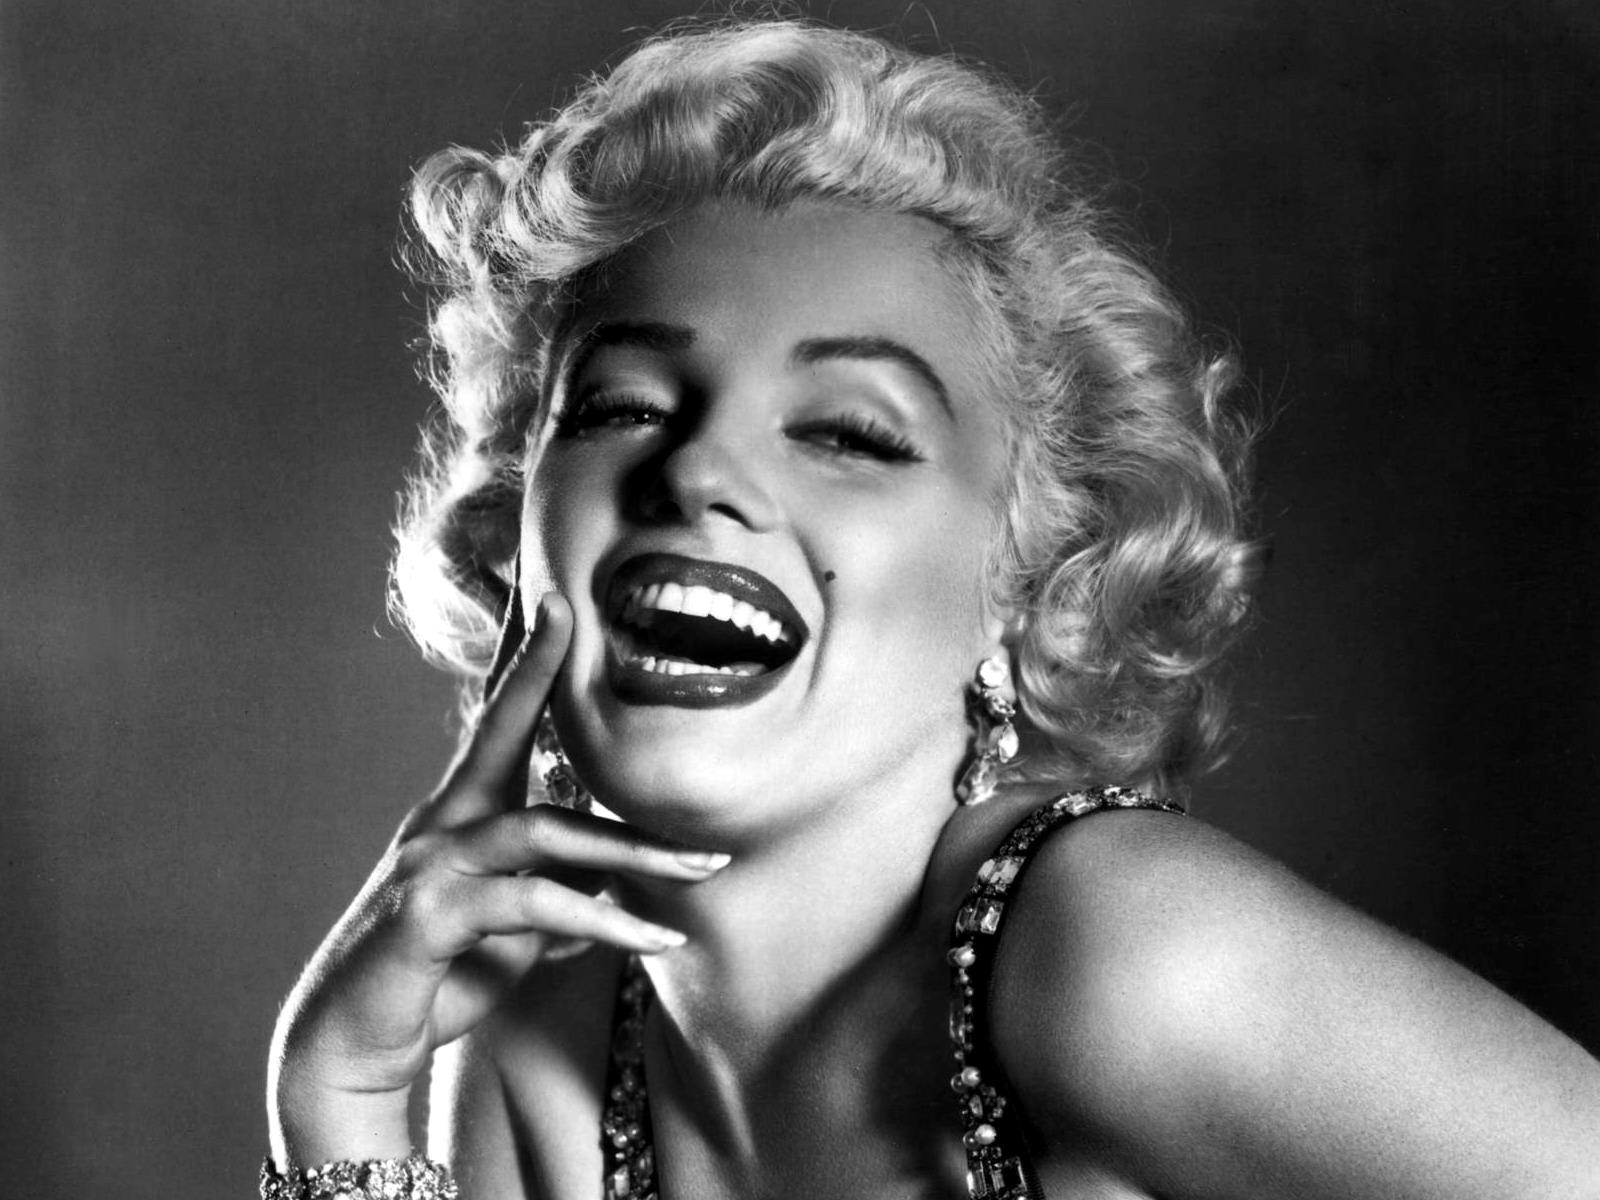 http://3.bp.blogspot.com/-eXLQ10wHe9Q/UB-QboRckpI/AAAAAAAAB7U/Nd1g2Bi8n4I/s1600/Marilyn-Monroe2.jpg